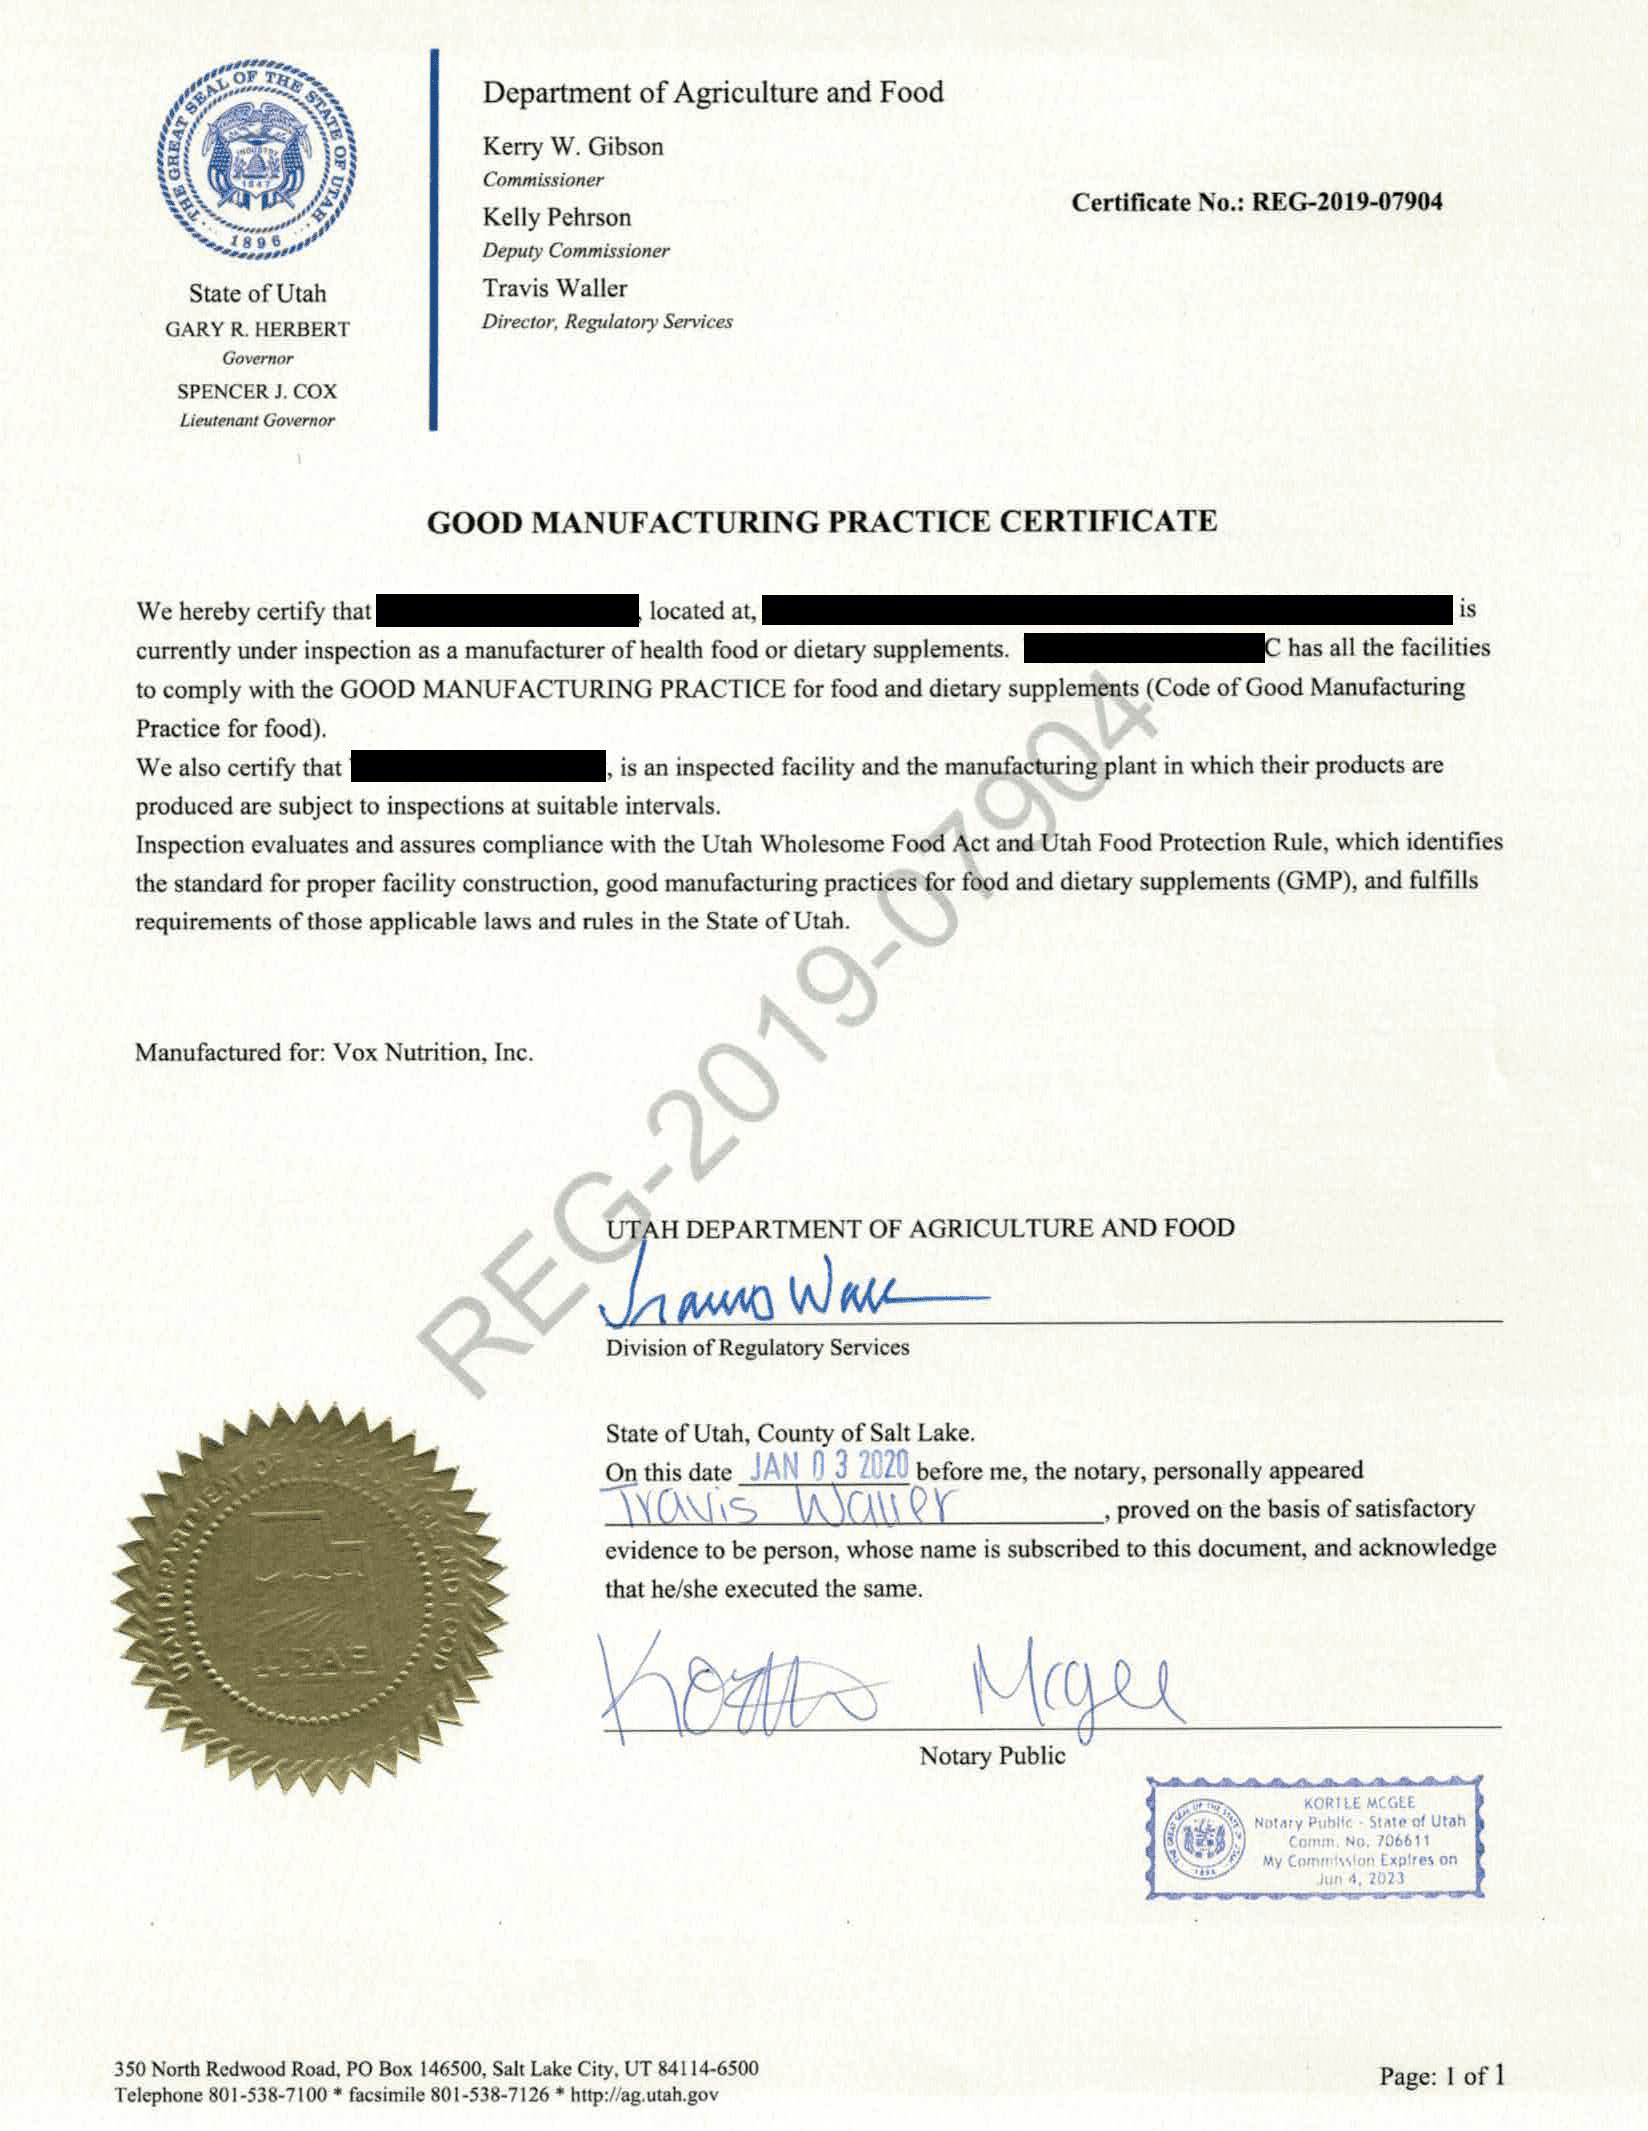 сертификат за добри производствени практики